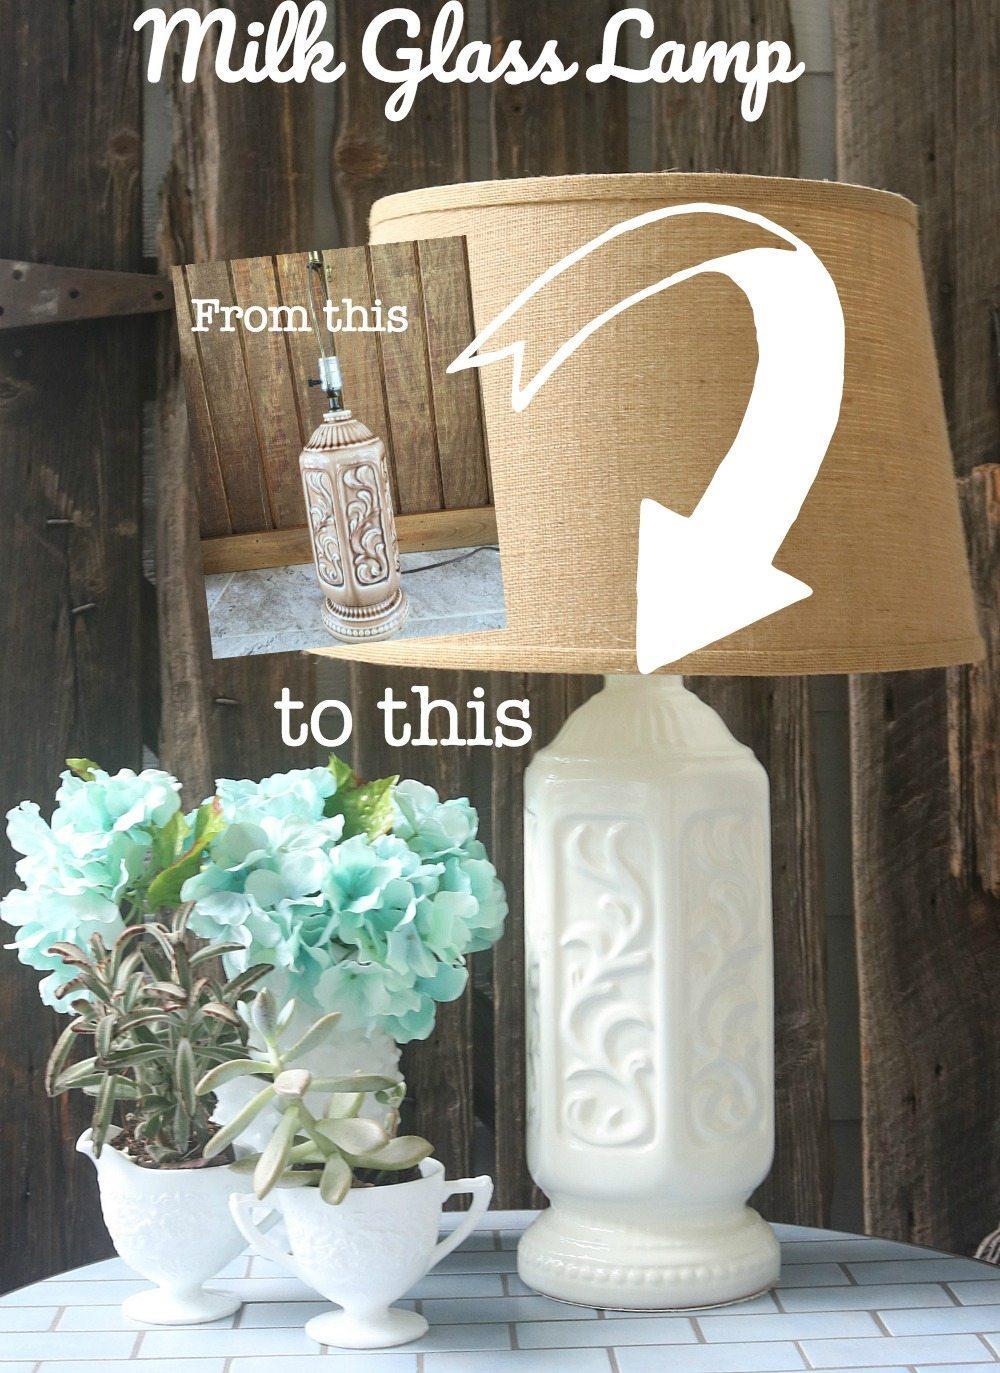 Milk Glass lamp transformation